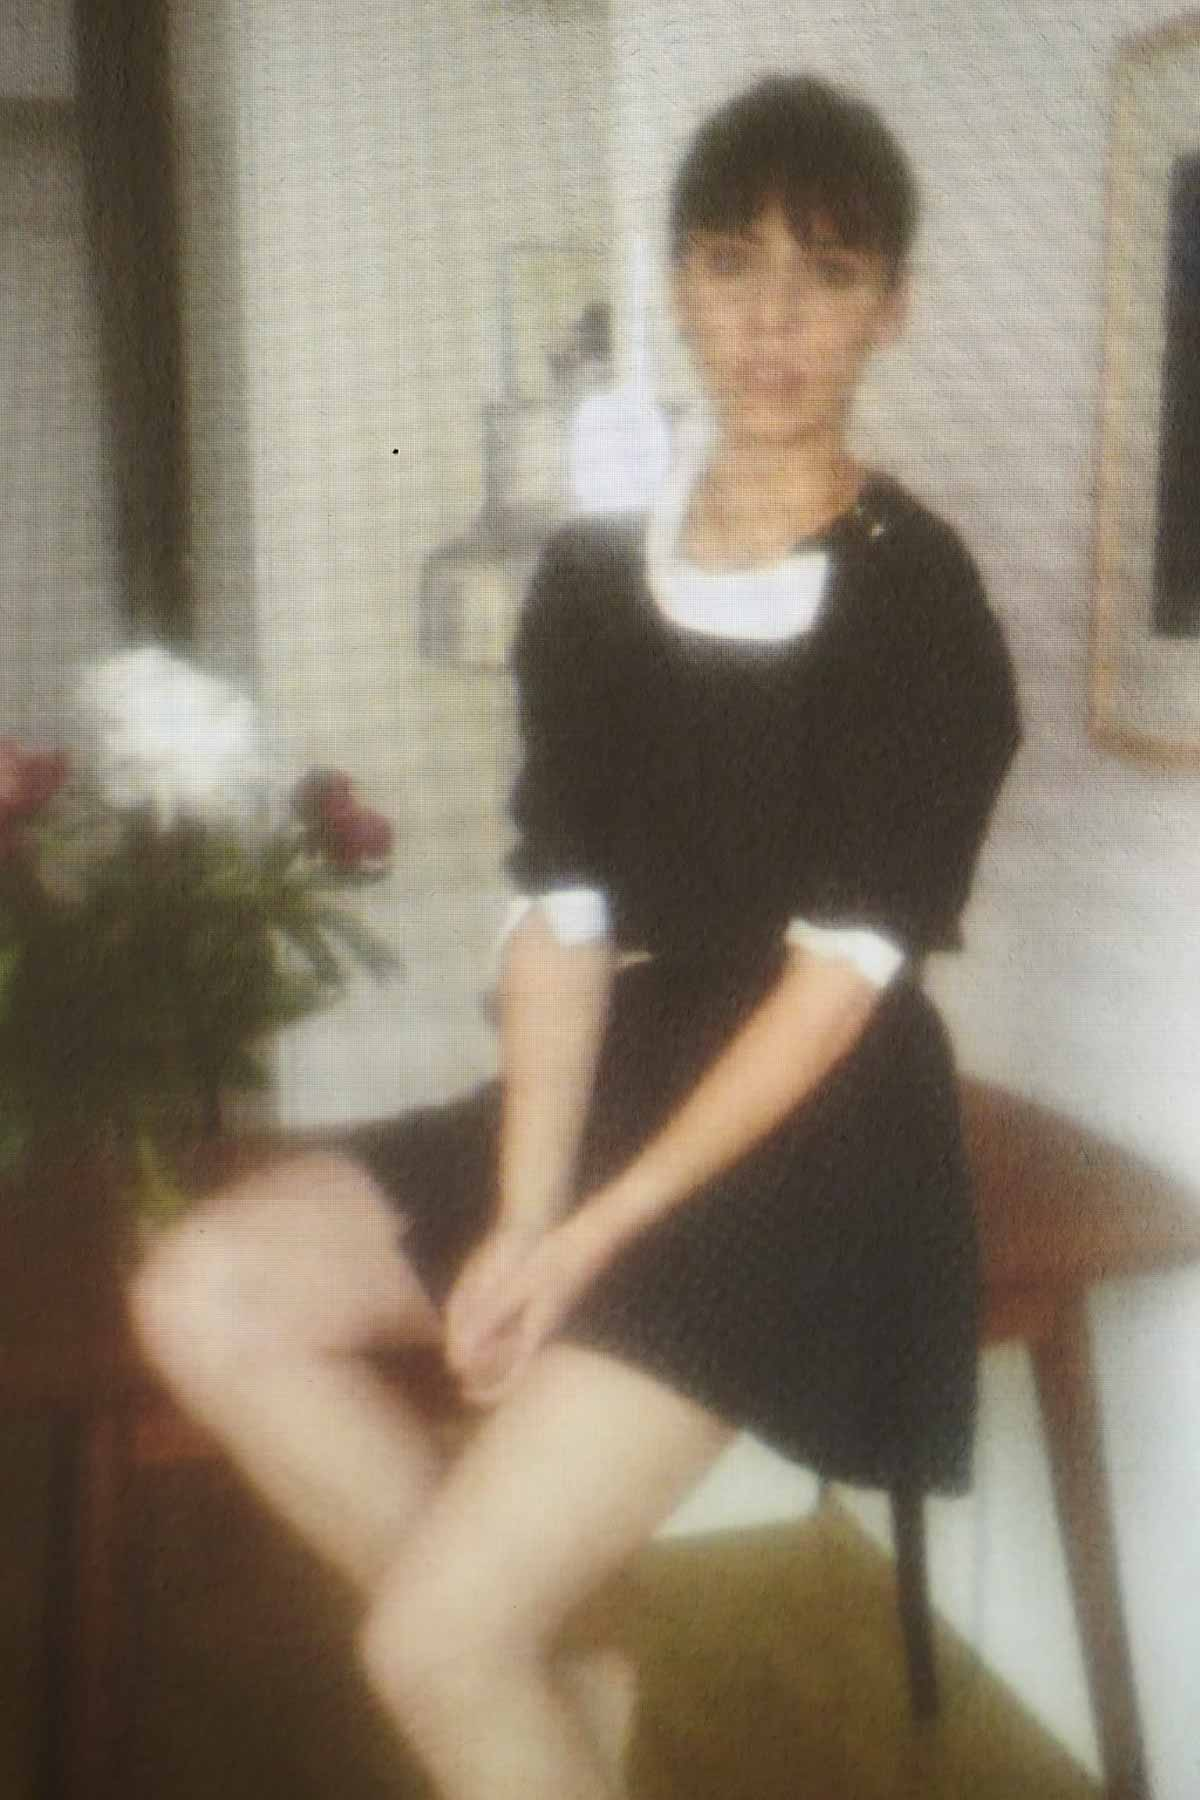 HANNAH, 23, DUESSELDORF, GERMANY hannahandandand790